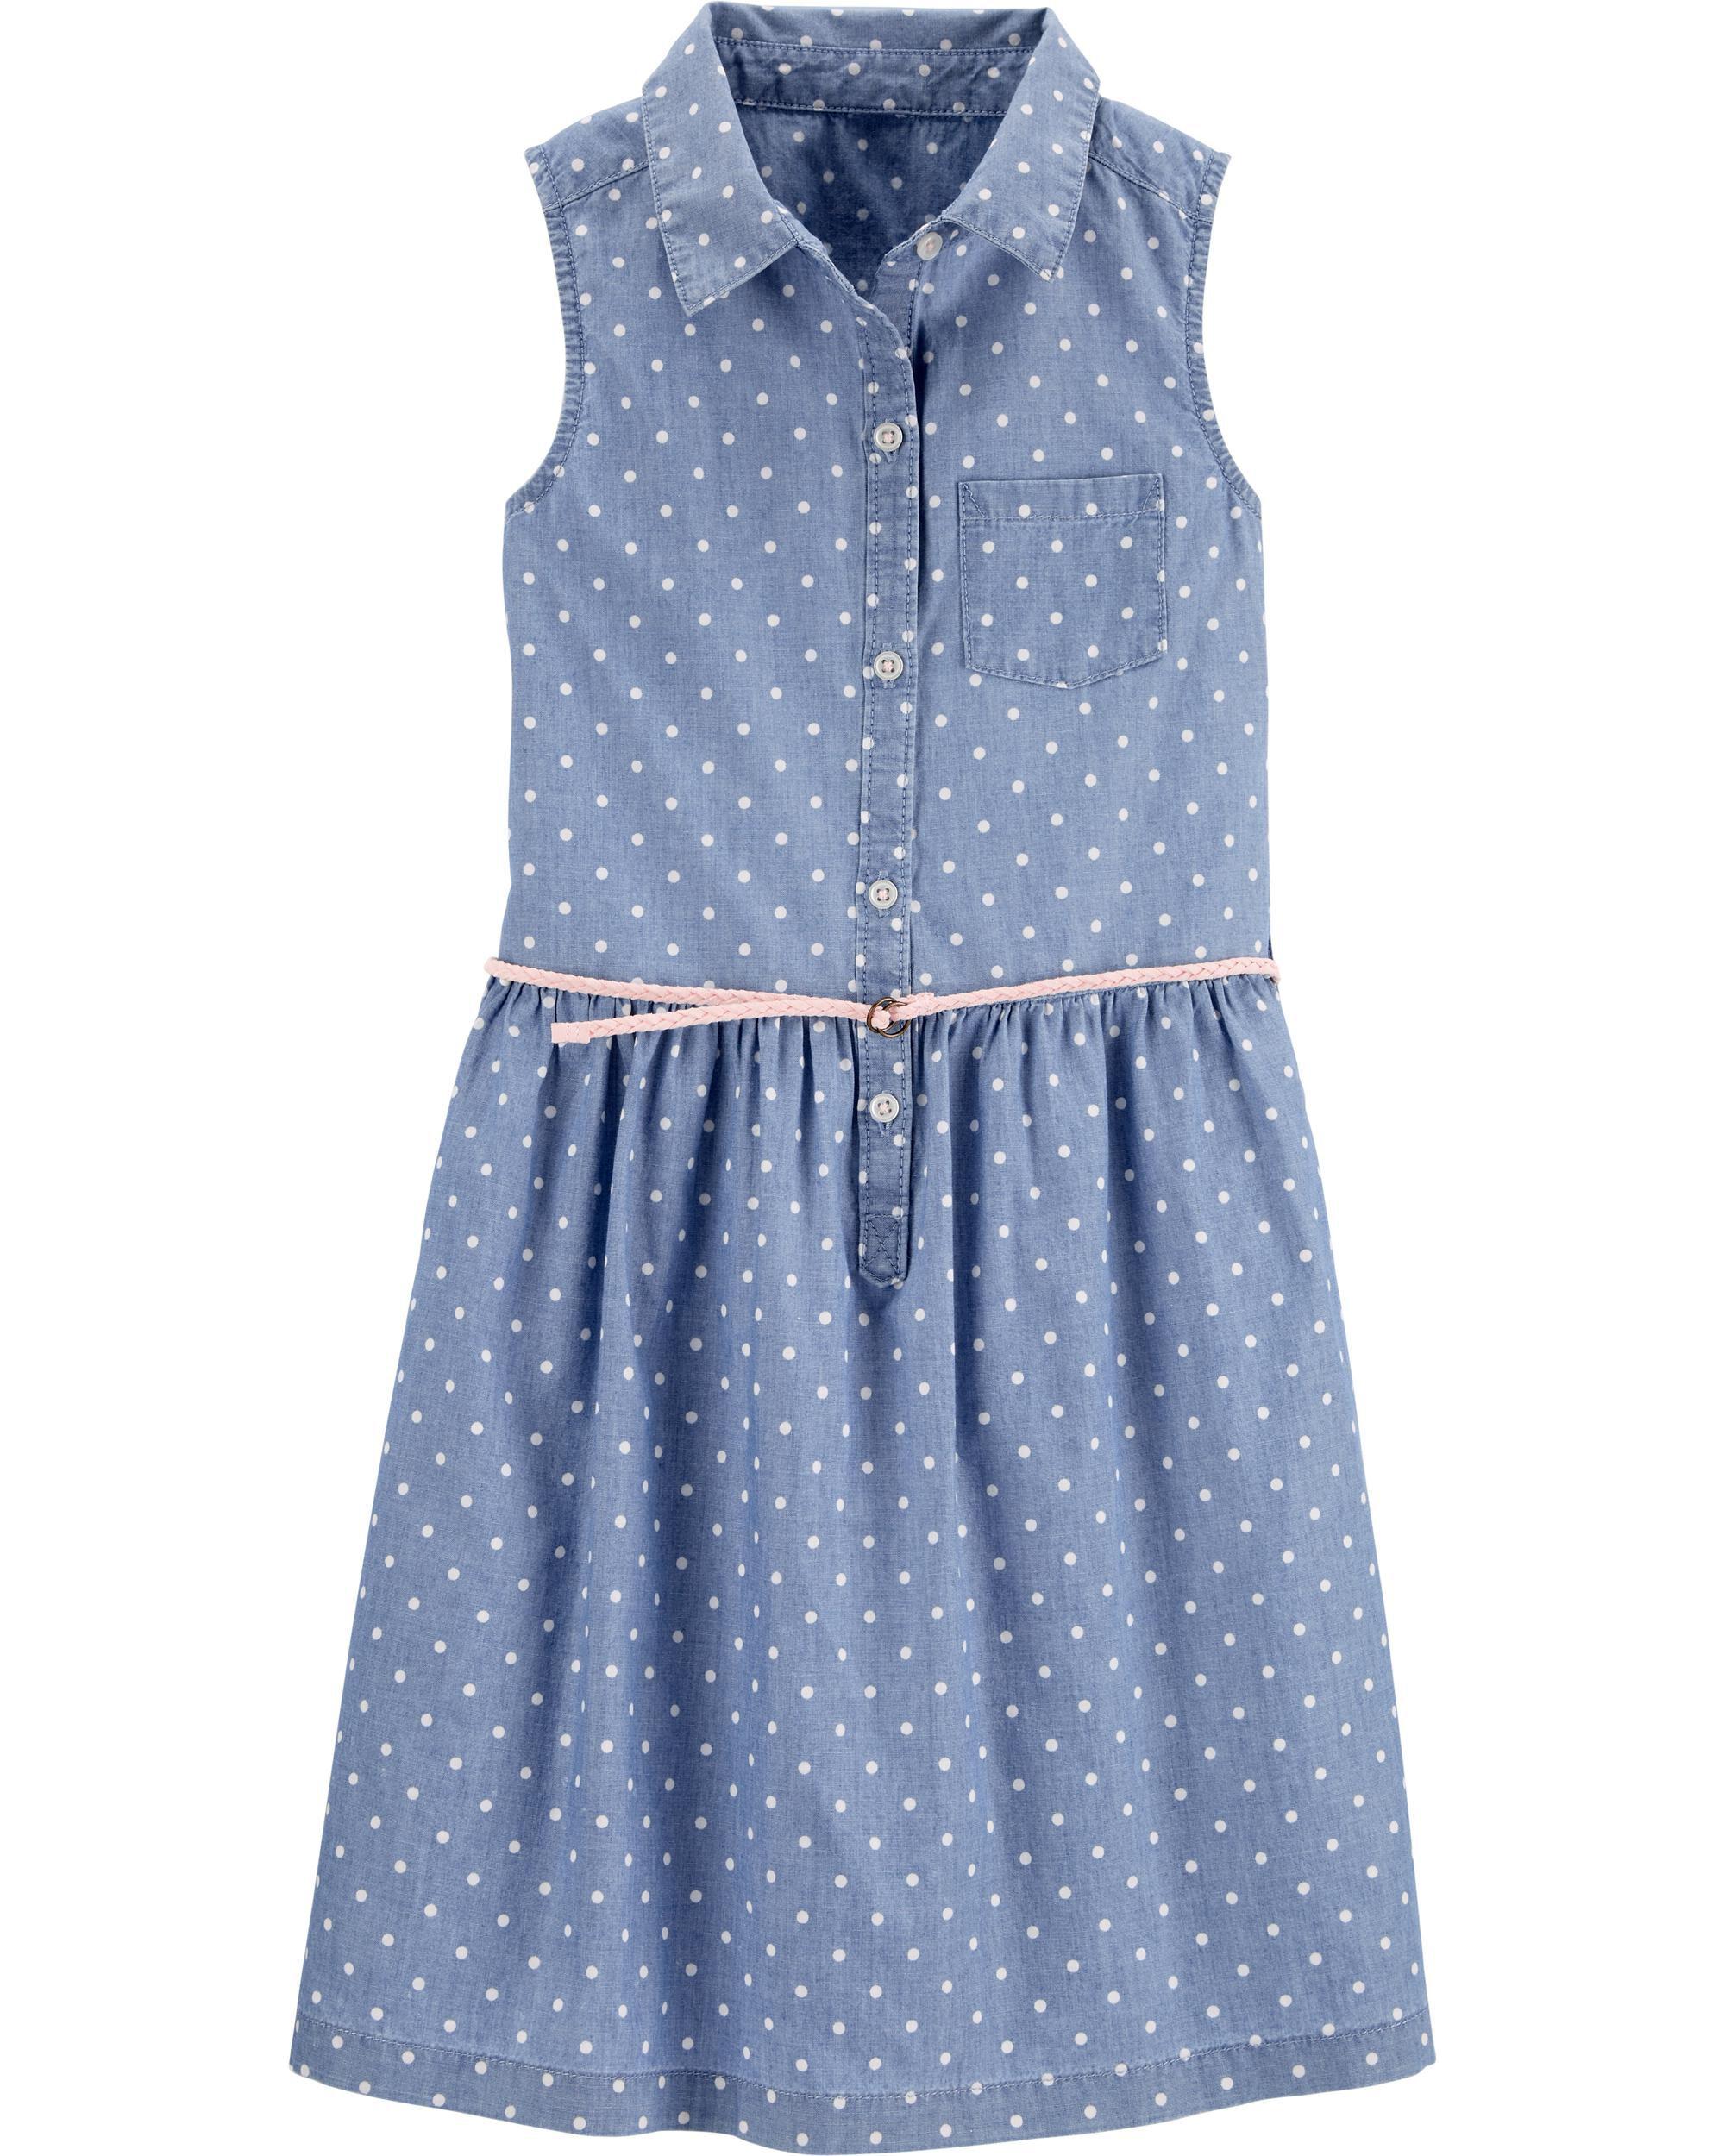 *CLEARANCE* Chambray Shirt Dress